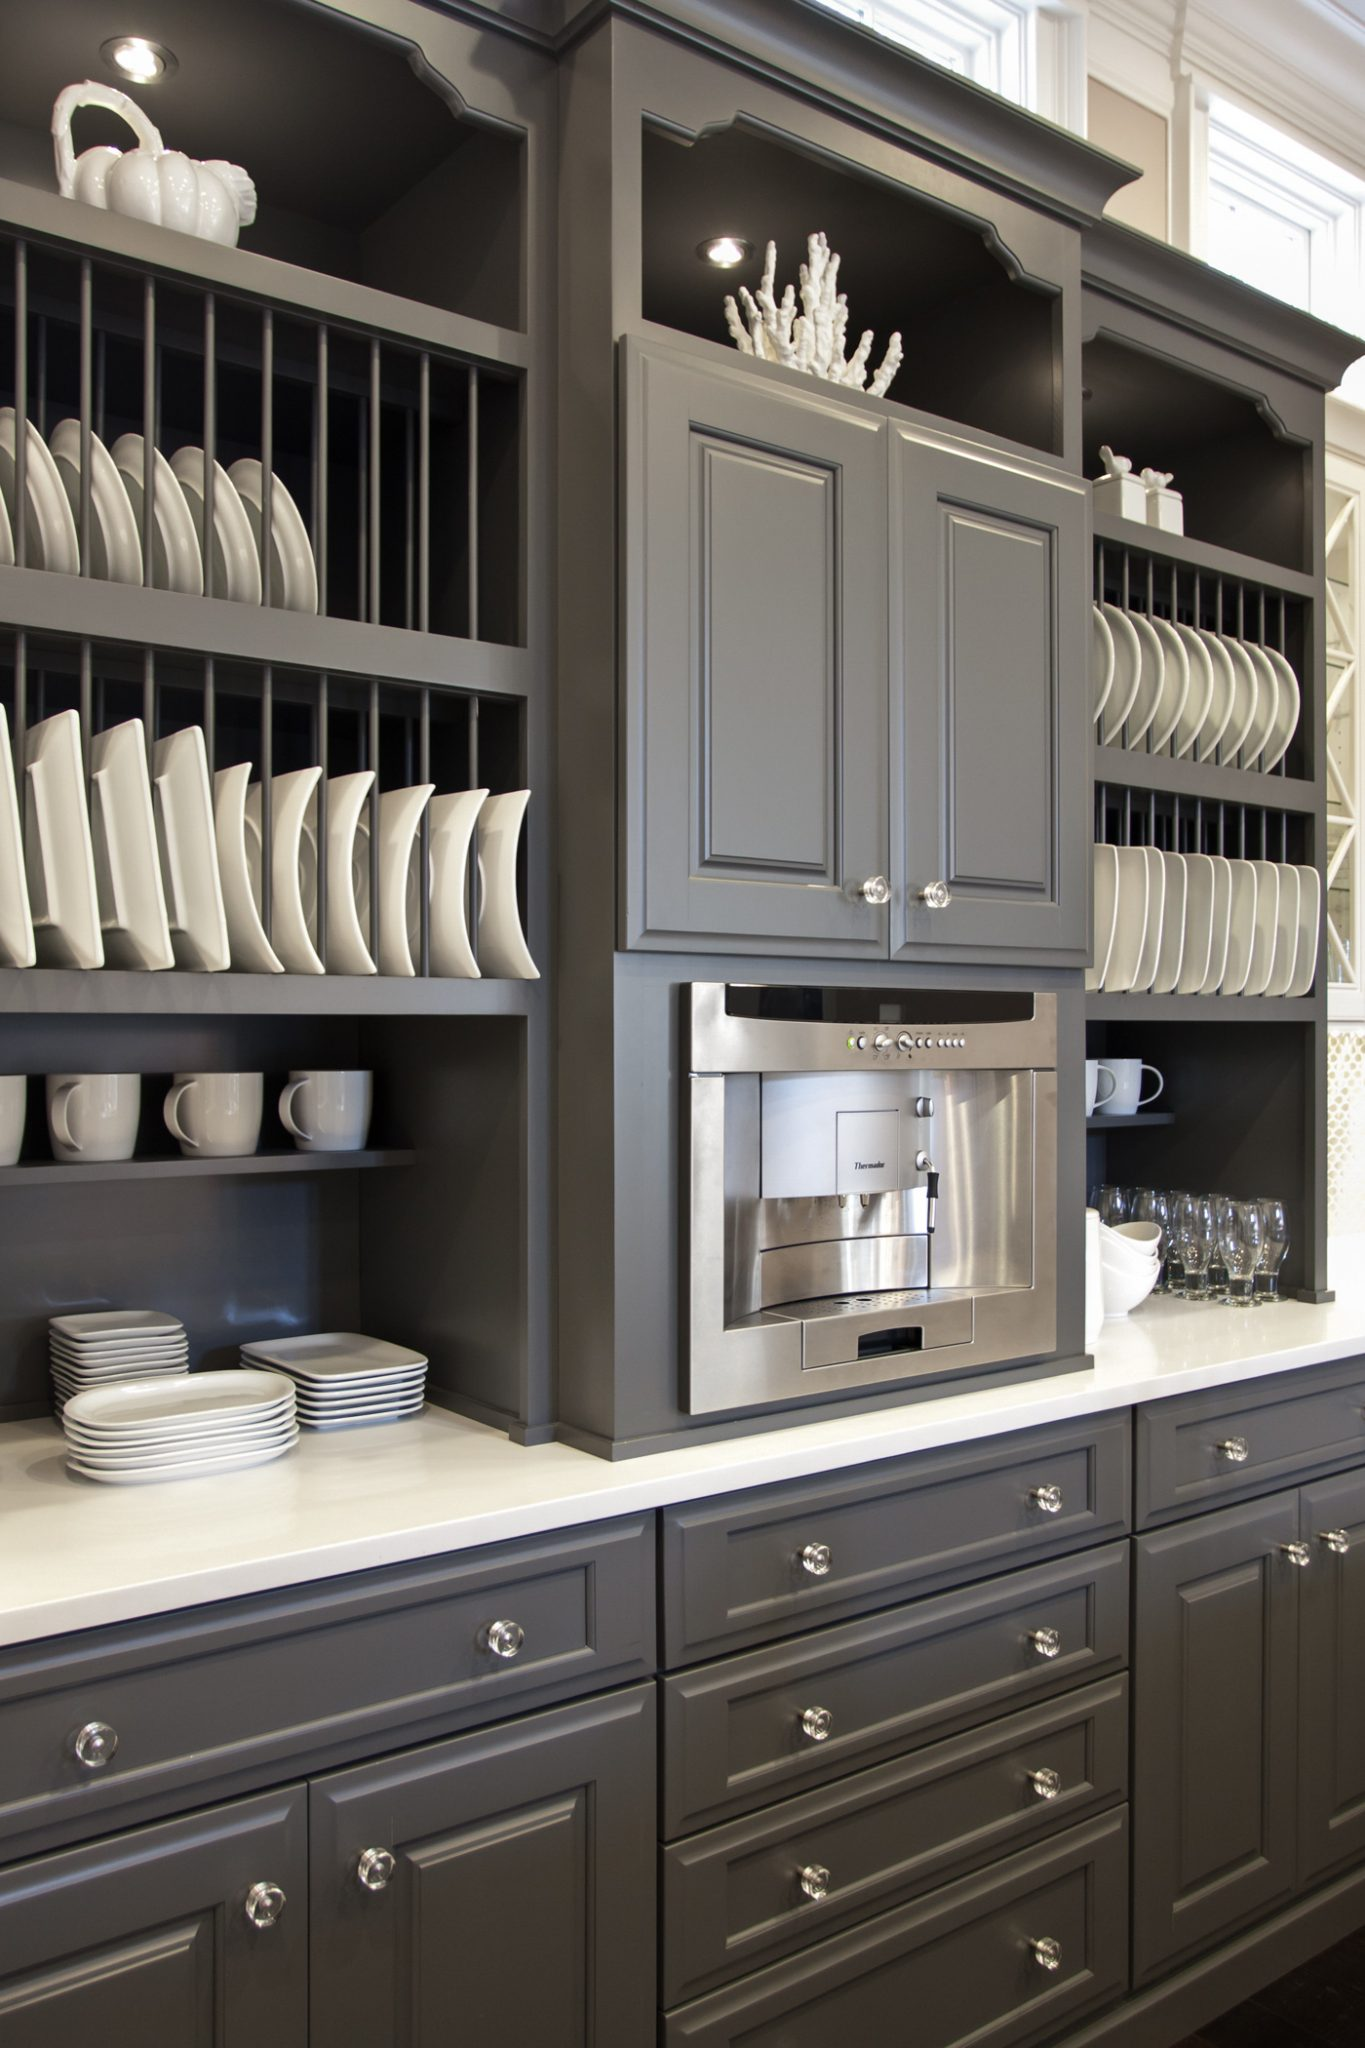 kitchens etc kitchen design on 30a 7 Kitchens Etc 30A